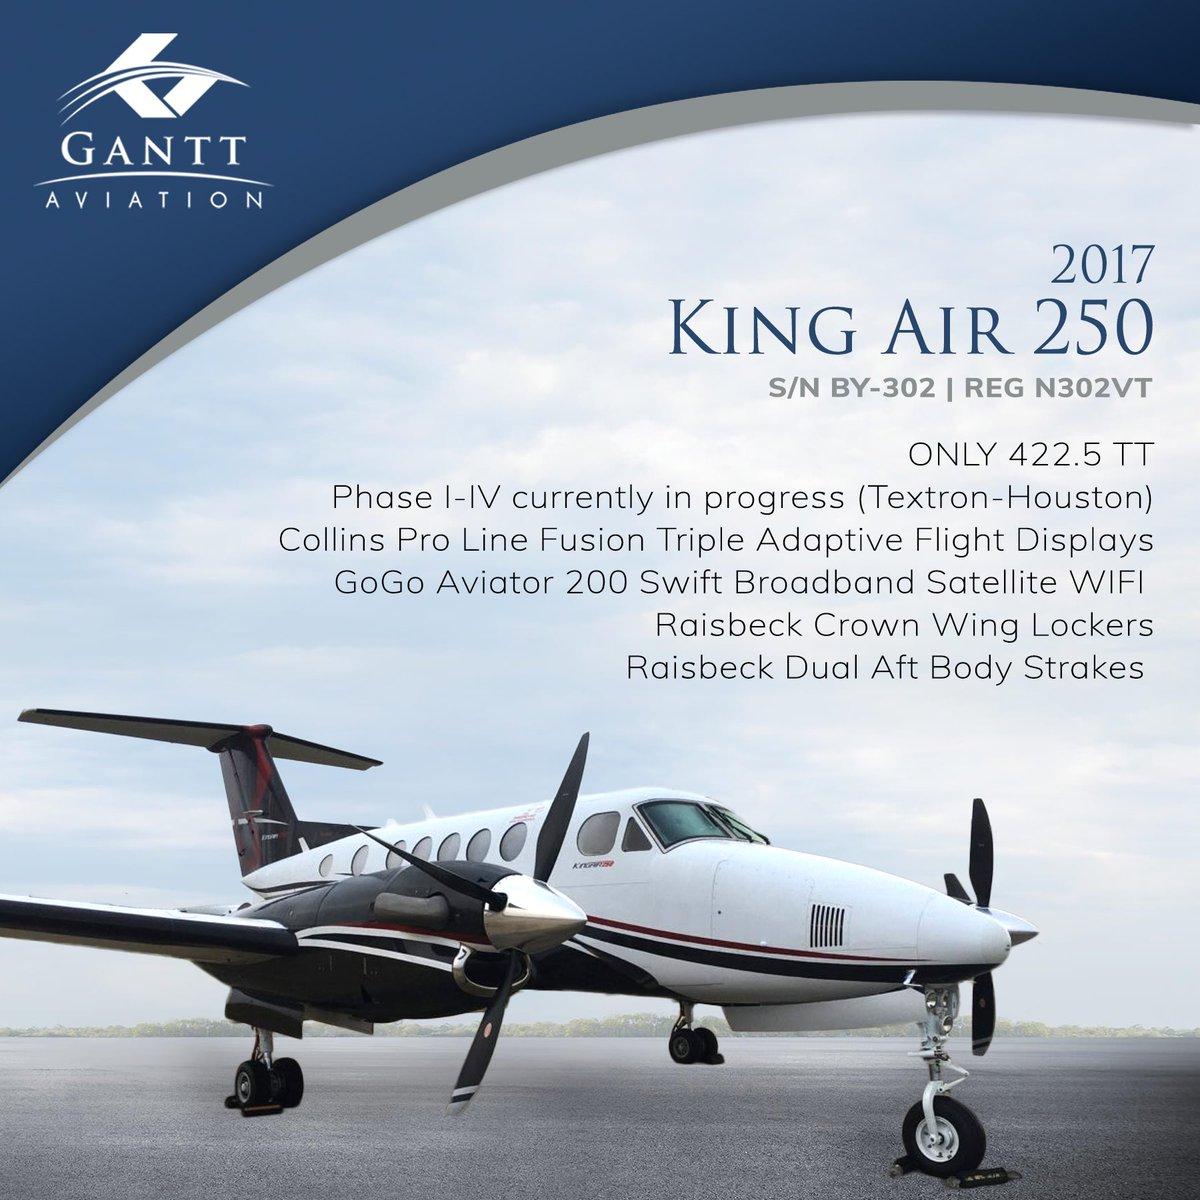 2017 King Air 250 for sale with Gantt Aviation.  Aircraft features fresh inspections , Triple Proline 21 flight displays as well as Swift broadband. For fulls specification visit https://t.co/HFQs4fUkfs  #bizjet #kingairnation #pilot https://t.co/vab6j9rXVz